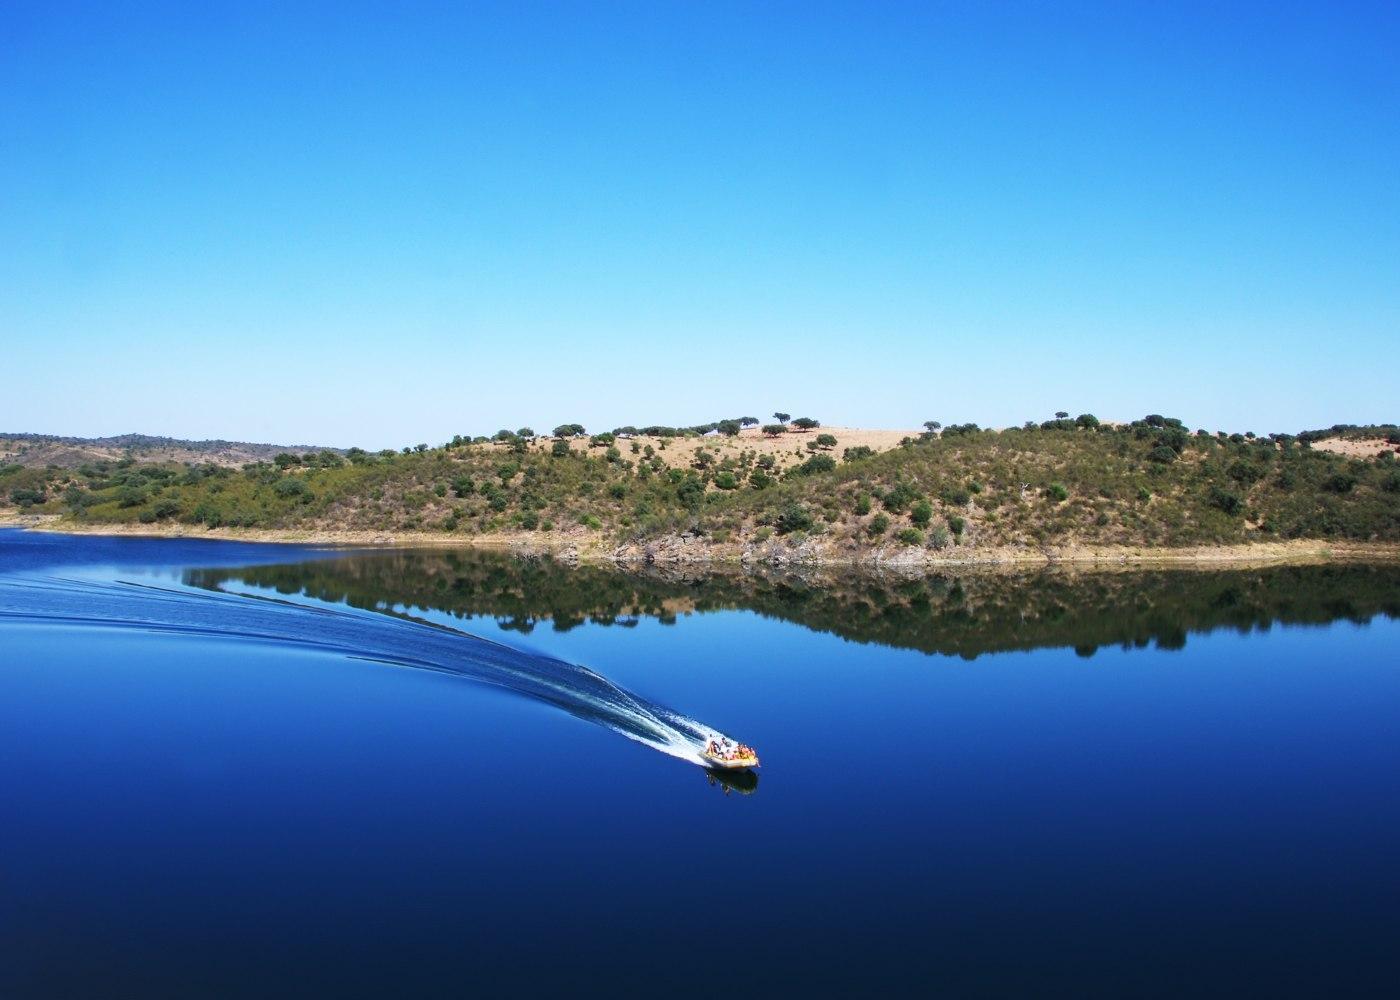 Barco na albufeira do Alqueva